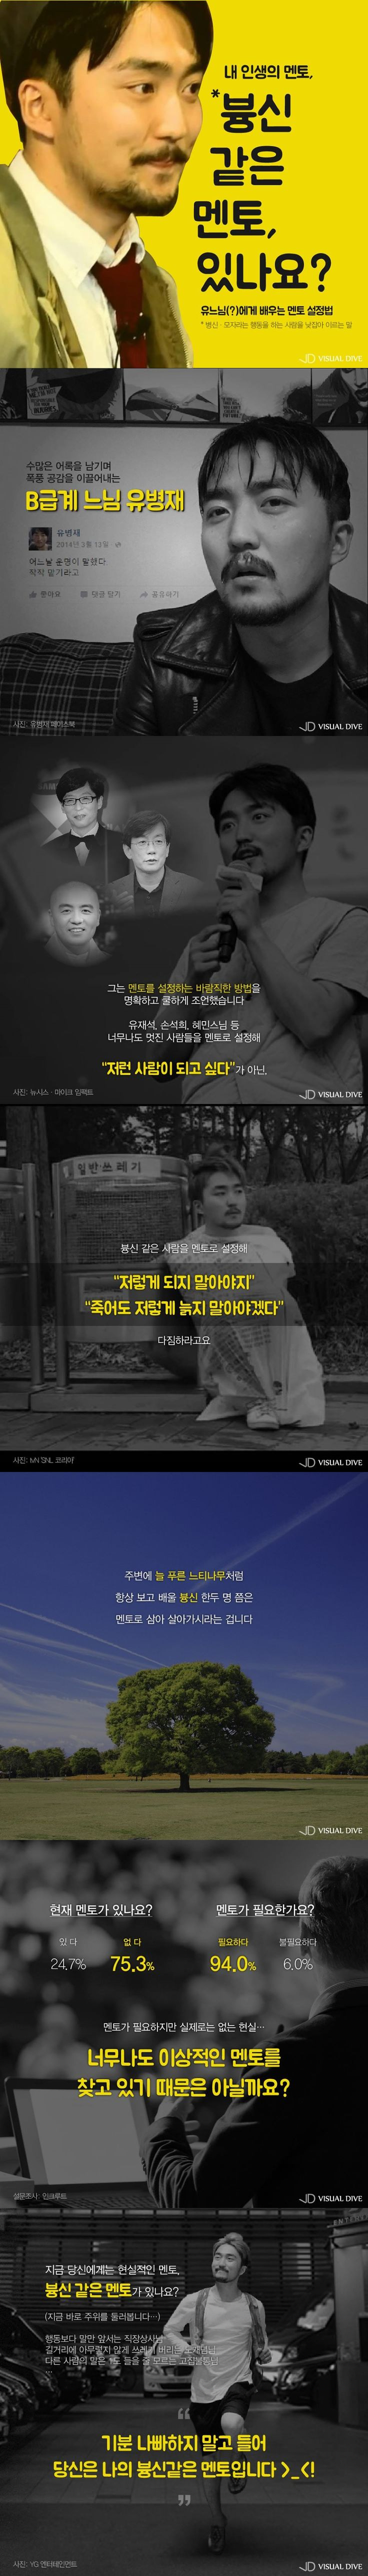 'B급 느님' 유병재에게 배우는 멘토 설정법 [카드뉴스] #Star / #Infographic ⓒ 비주얼다이브 무단 복사·전재·재배포 금지